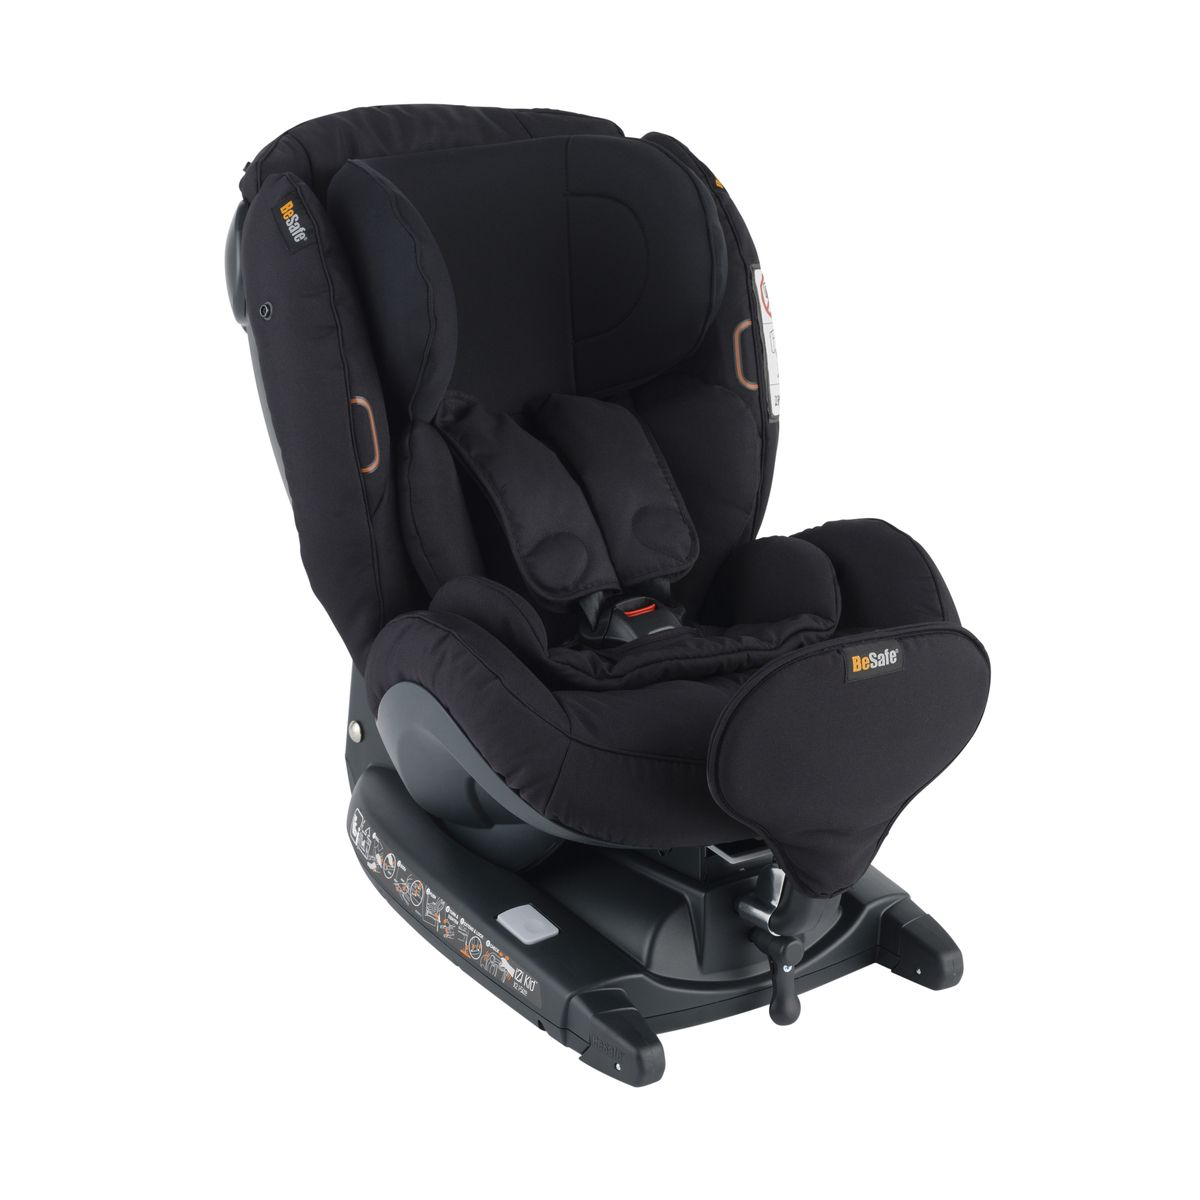 Автокресло BeSafe iZi Kid X3 i-Size Fresh Black Cab (+ Защитный чехол СМЕШАРИКИ в подарок!)